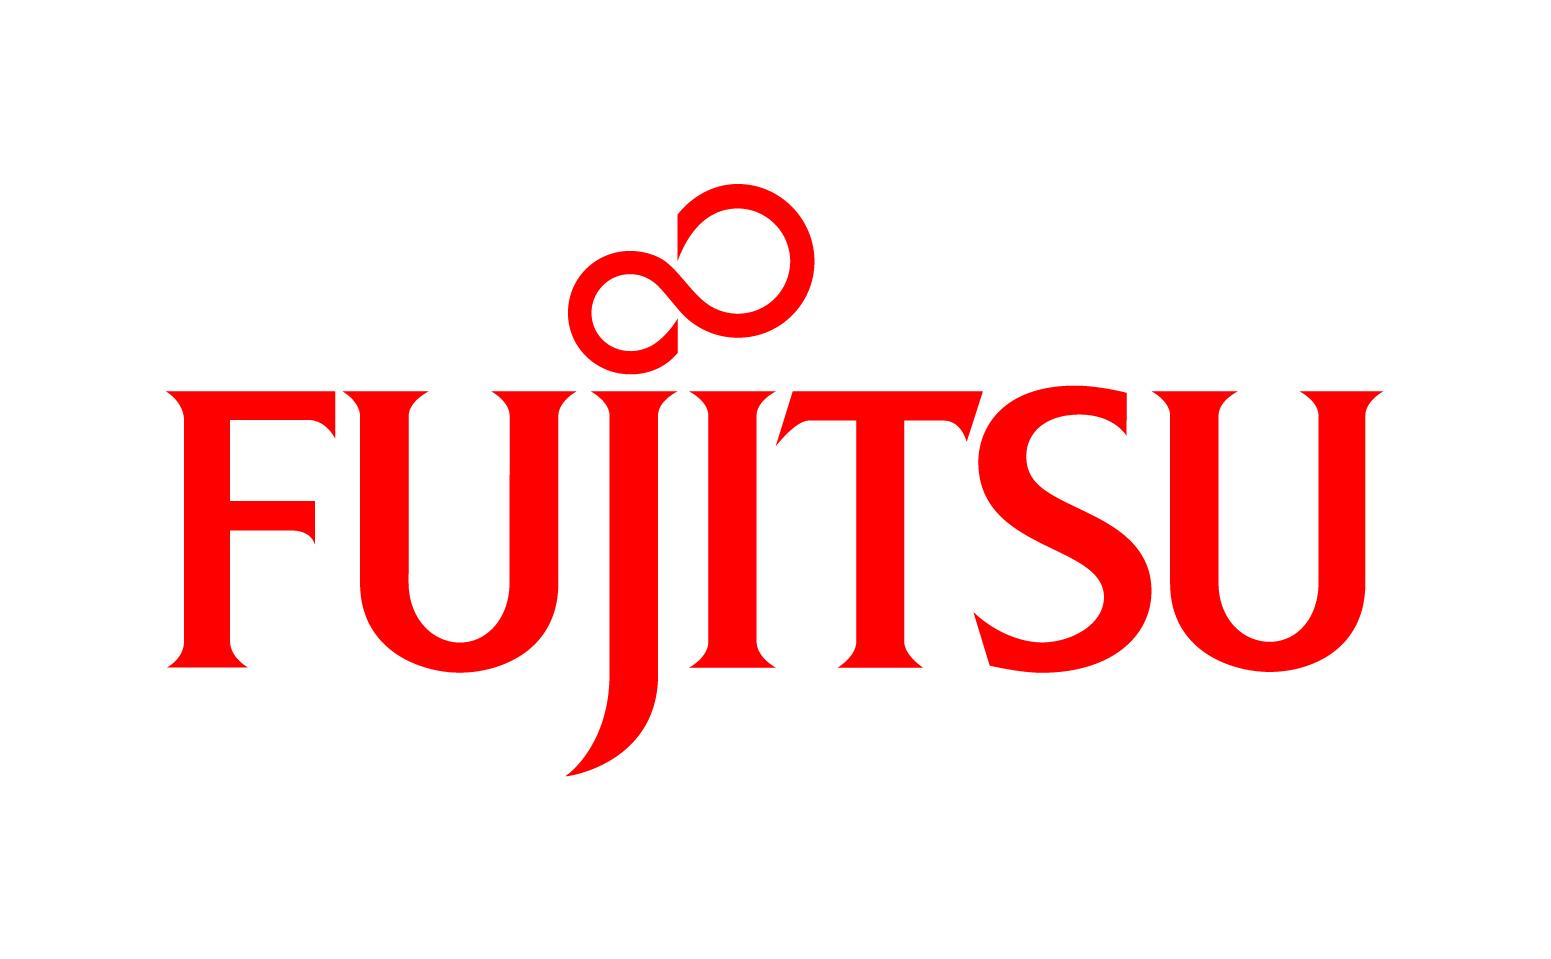 FUJITSU Digitizer Pen & tether set